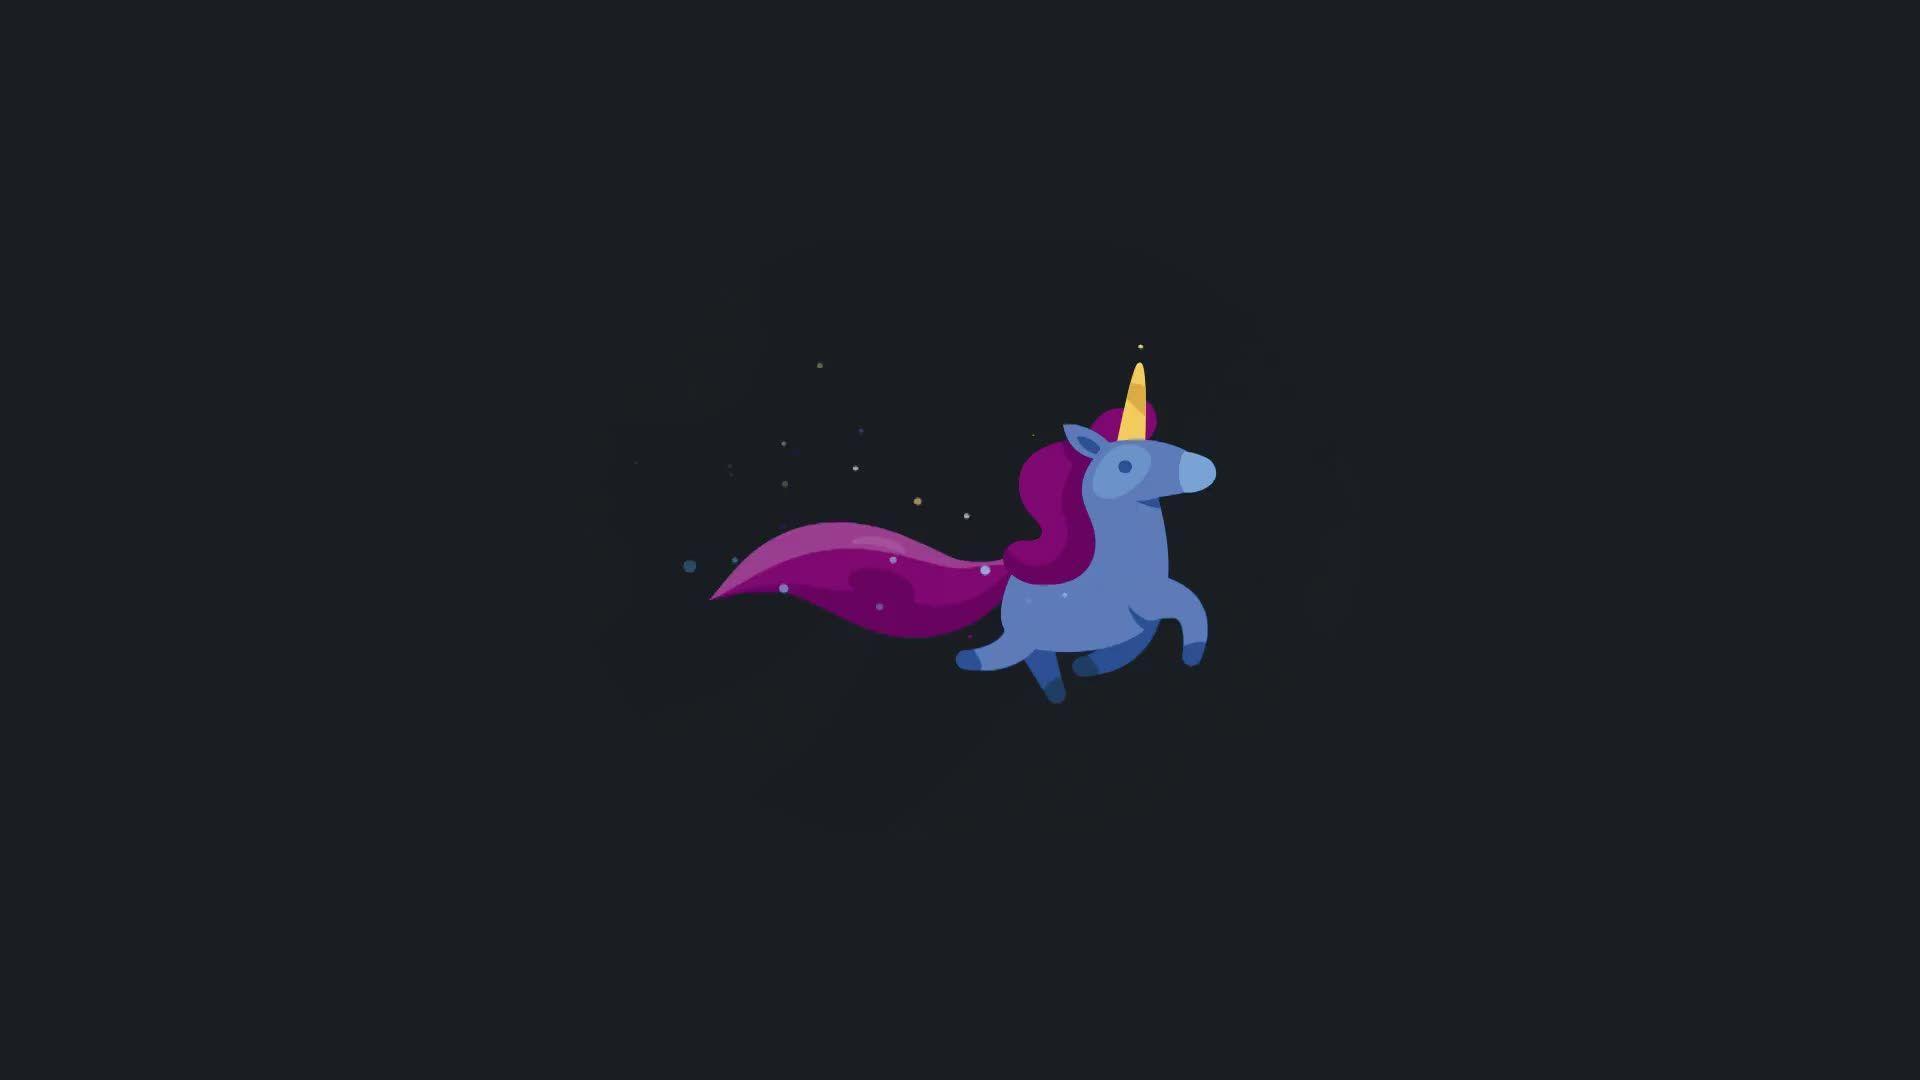 Unicorn Pc Wallpapers Top Free Unicorn Pc Backgrounds Wallpaperaccess